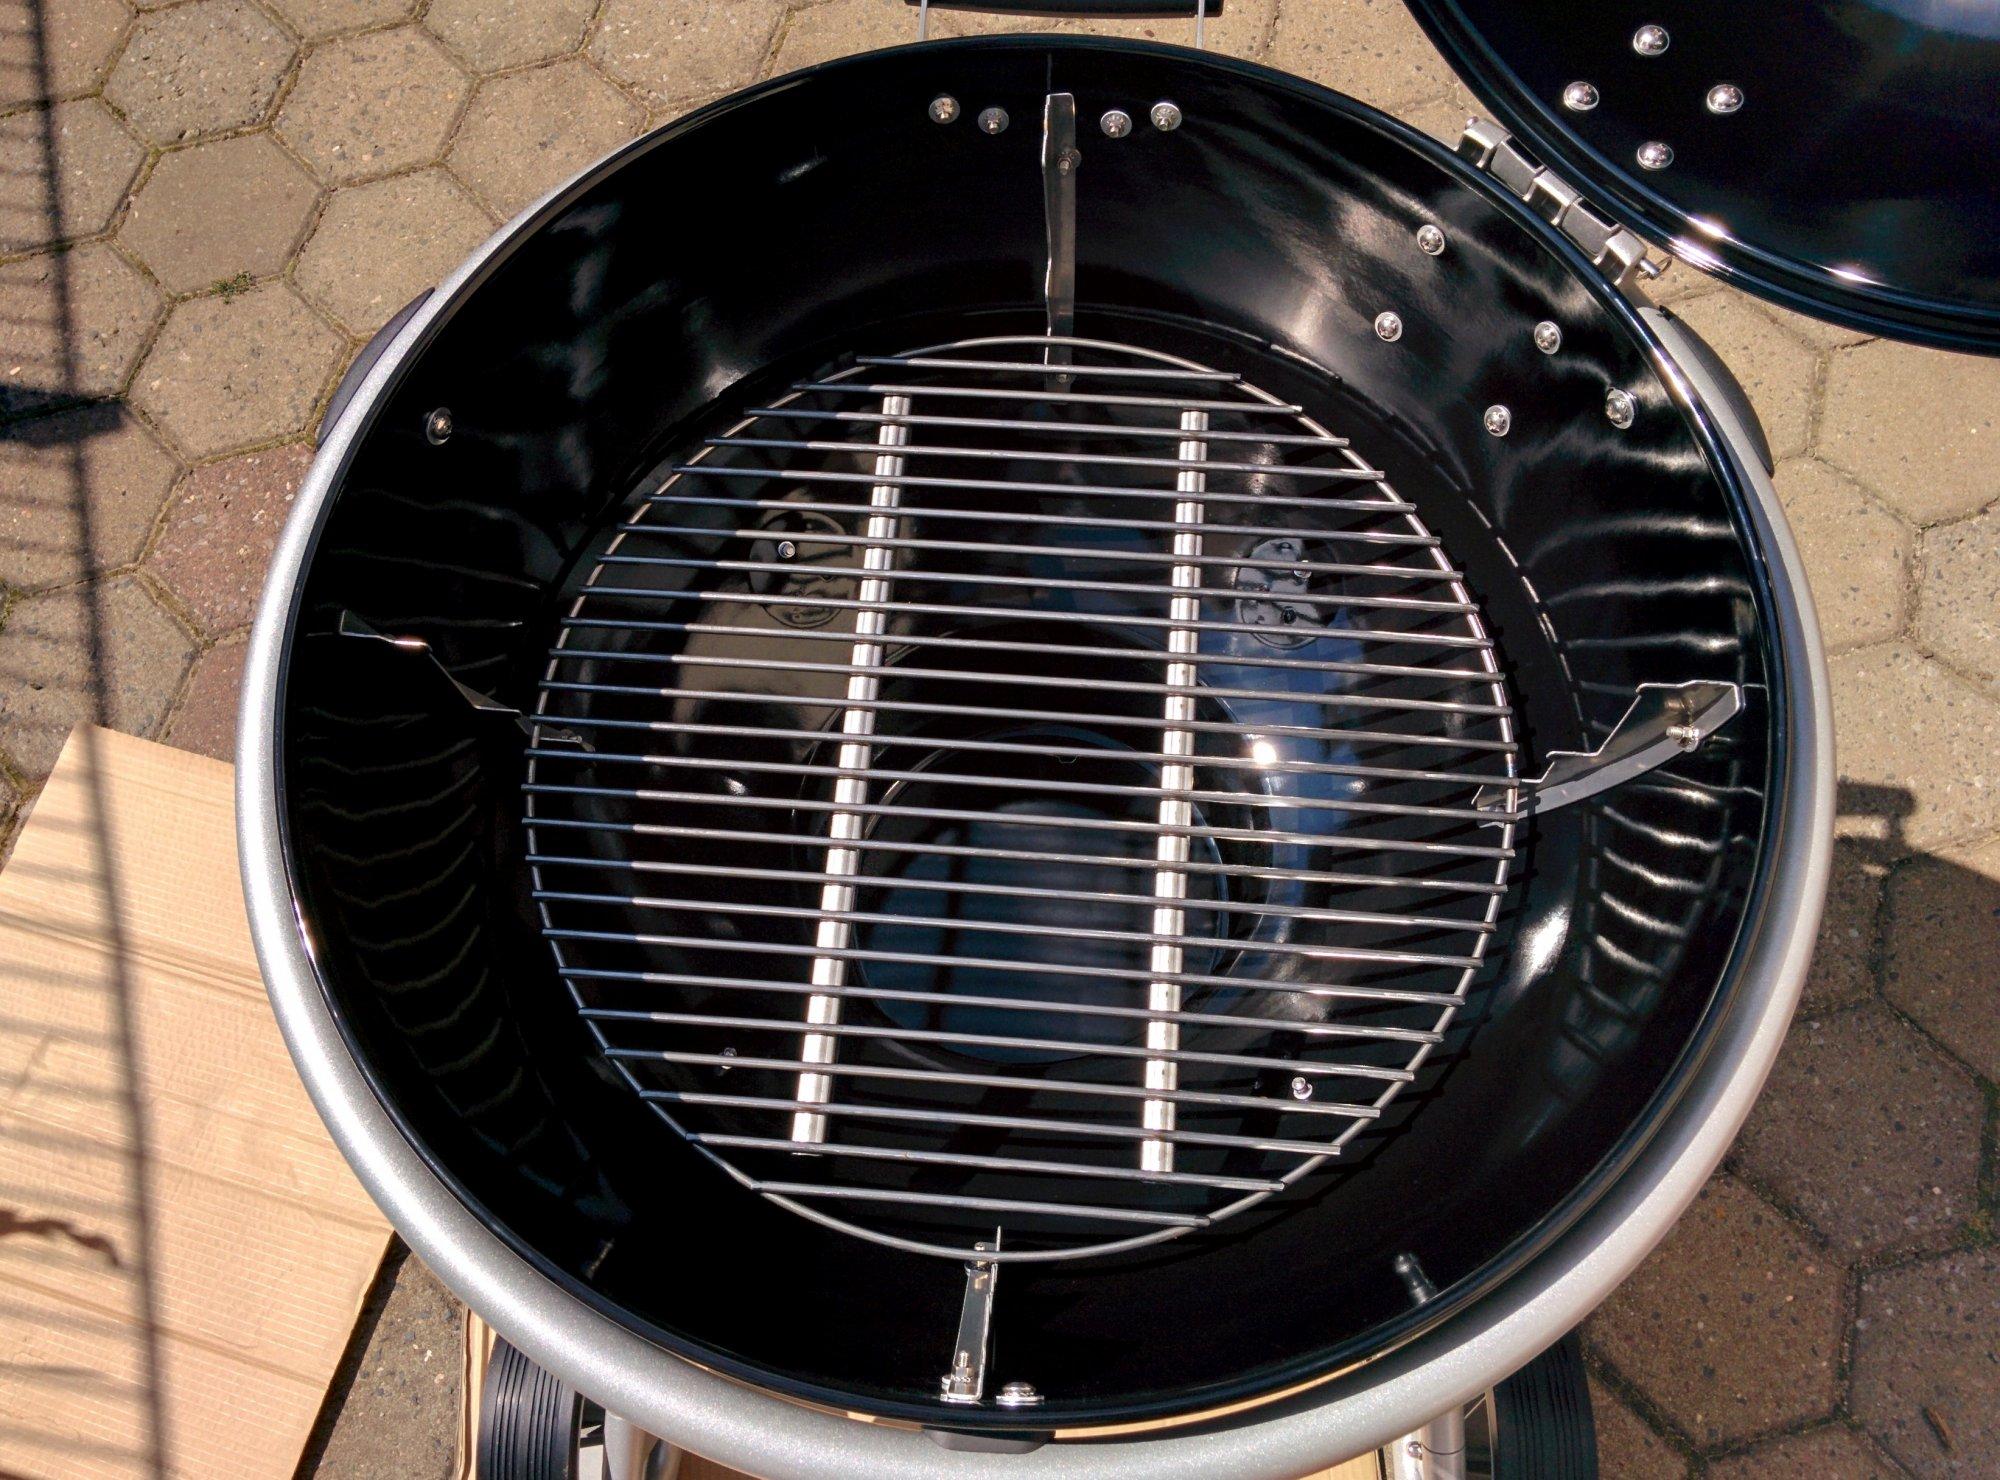 Tepro Toronto Holzkohlegrill Idealo : Holzkohlegrill lotusgrill cooker minigrill wie anzunden toronto